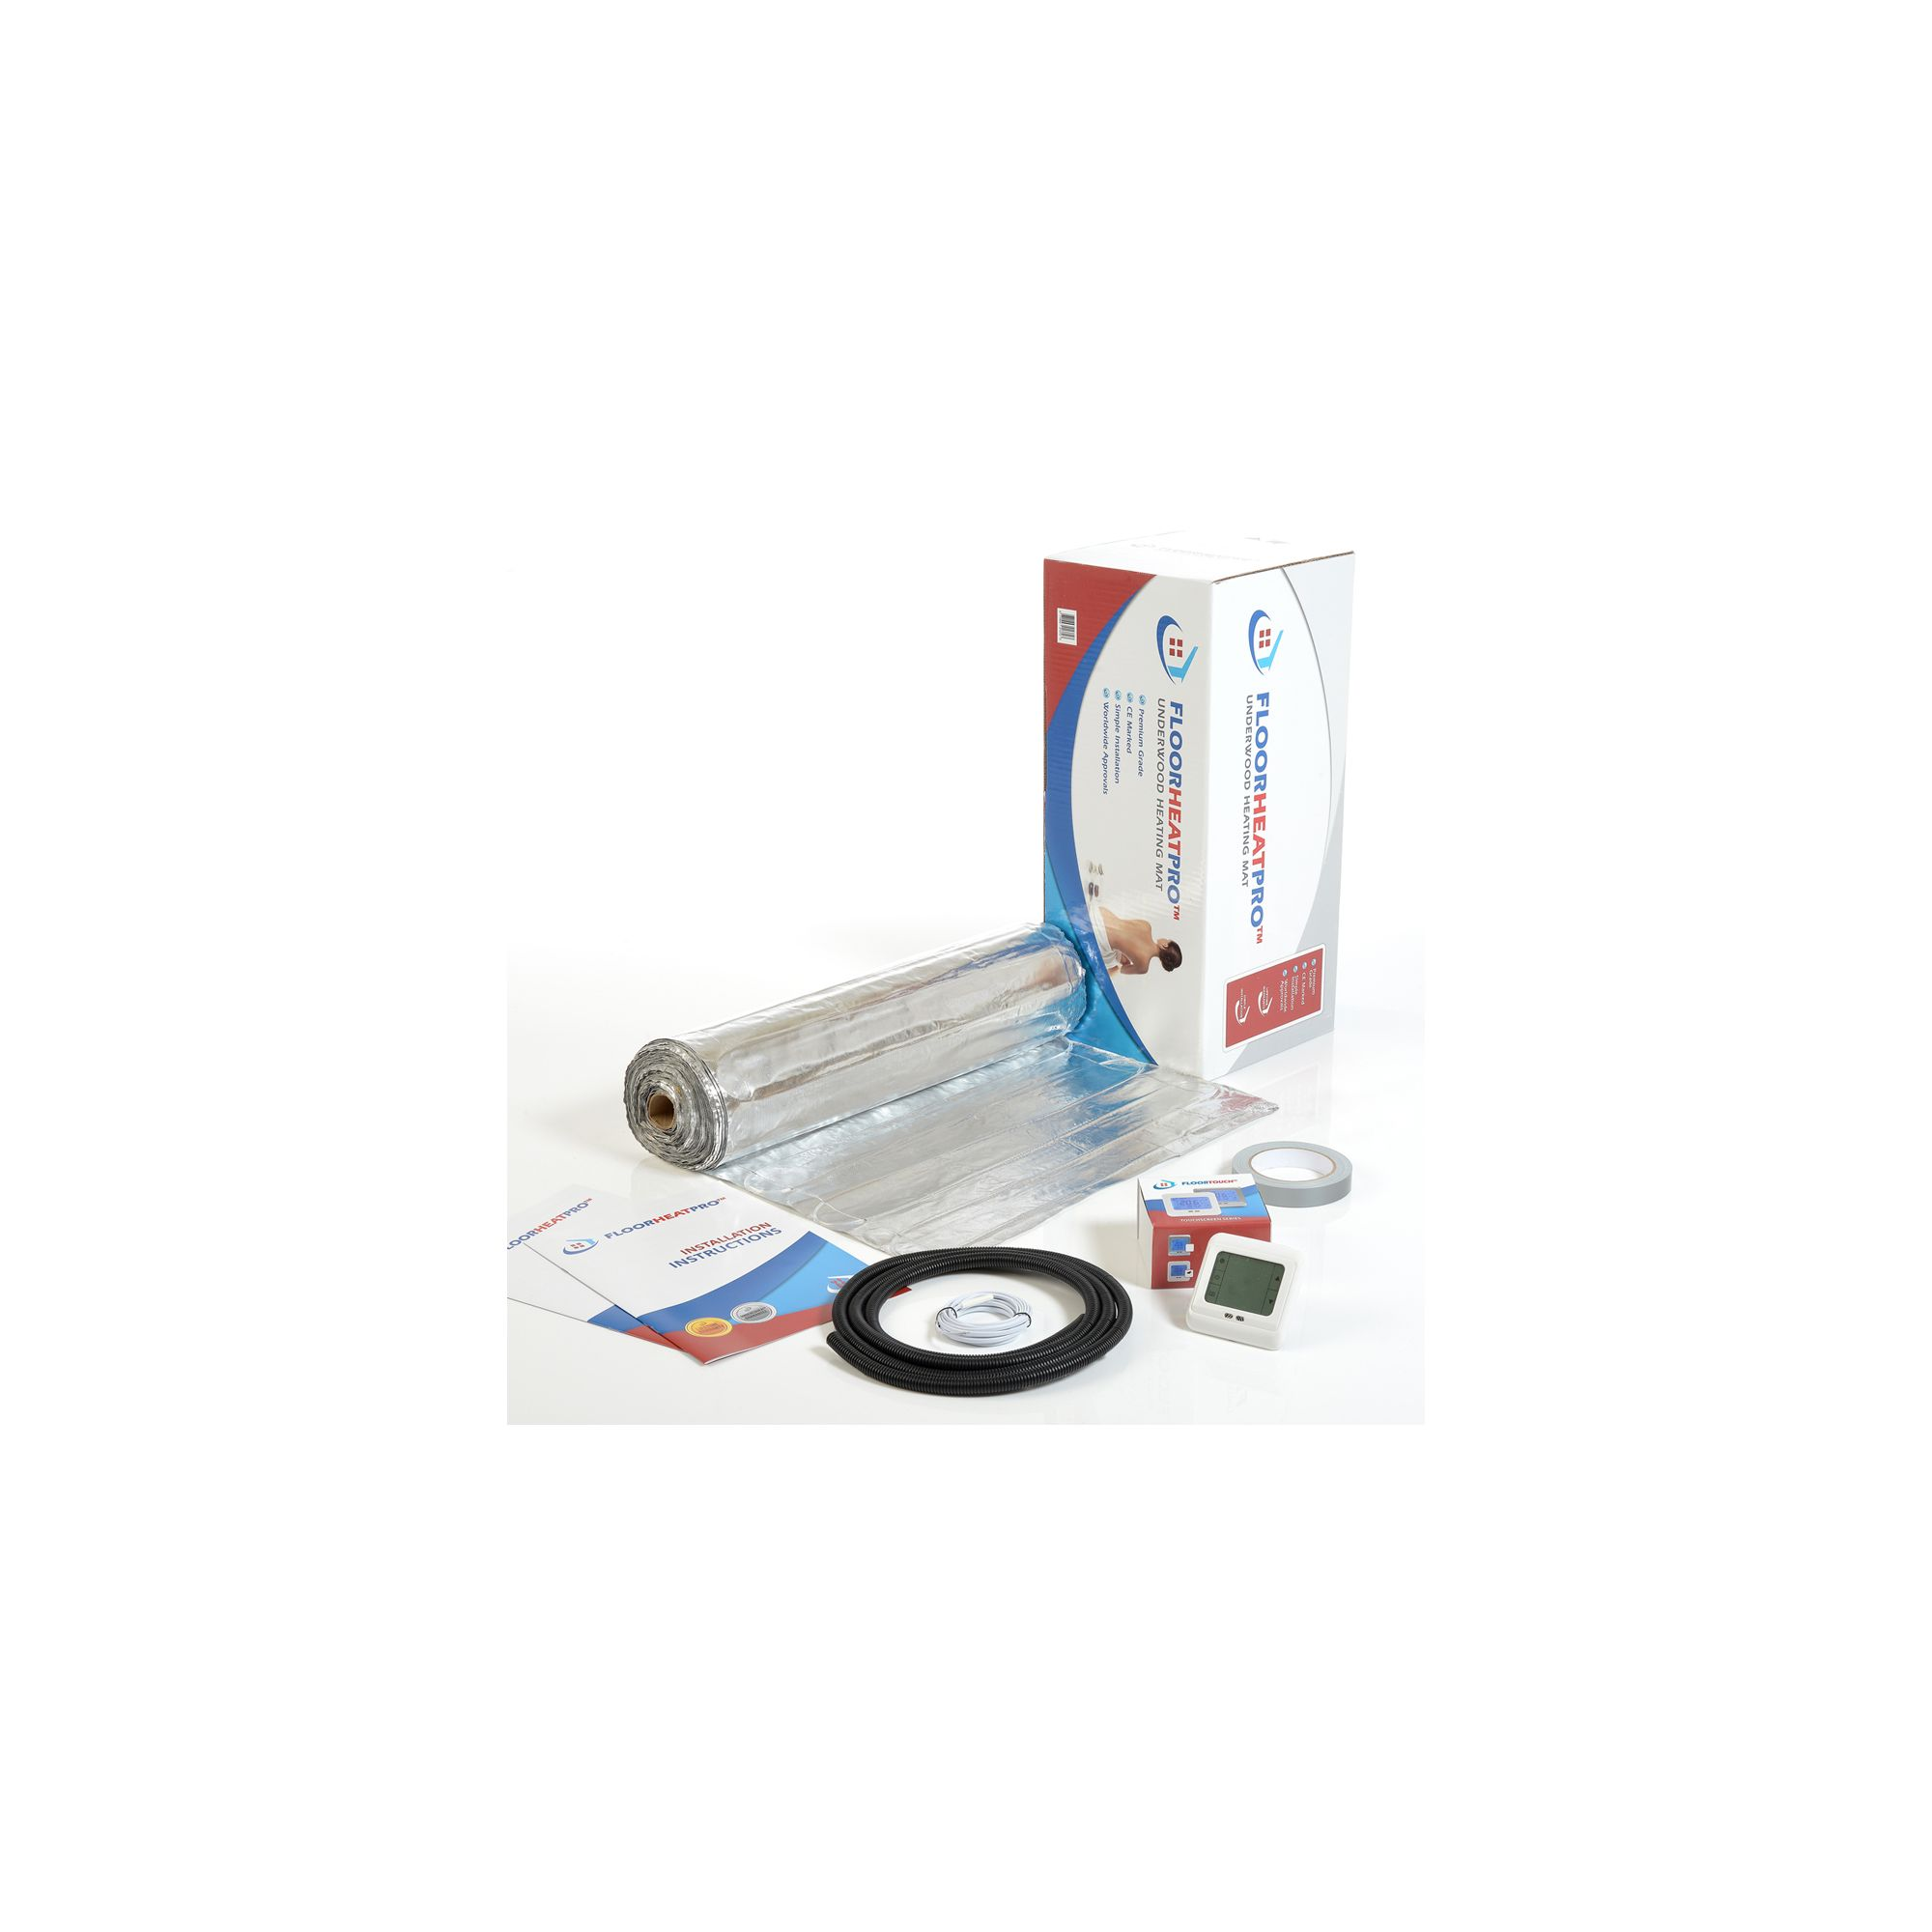 24.0 m2 - Underfloor Electric Heating Kit - Laminate at Tesco Direct